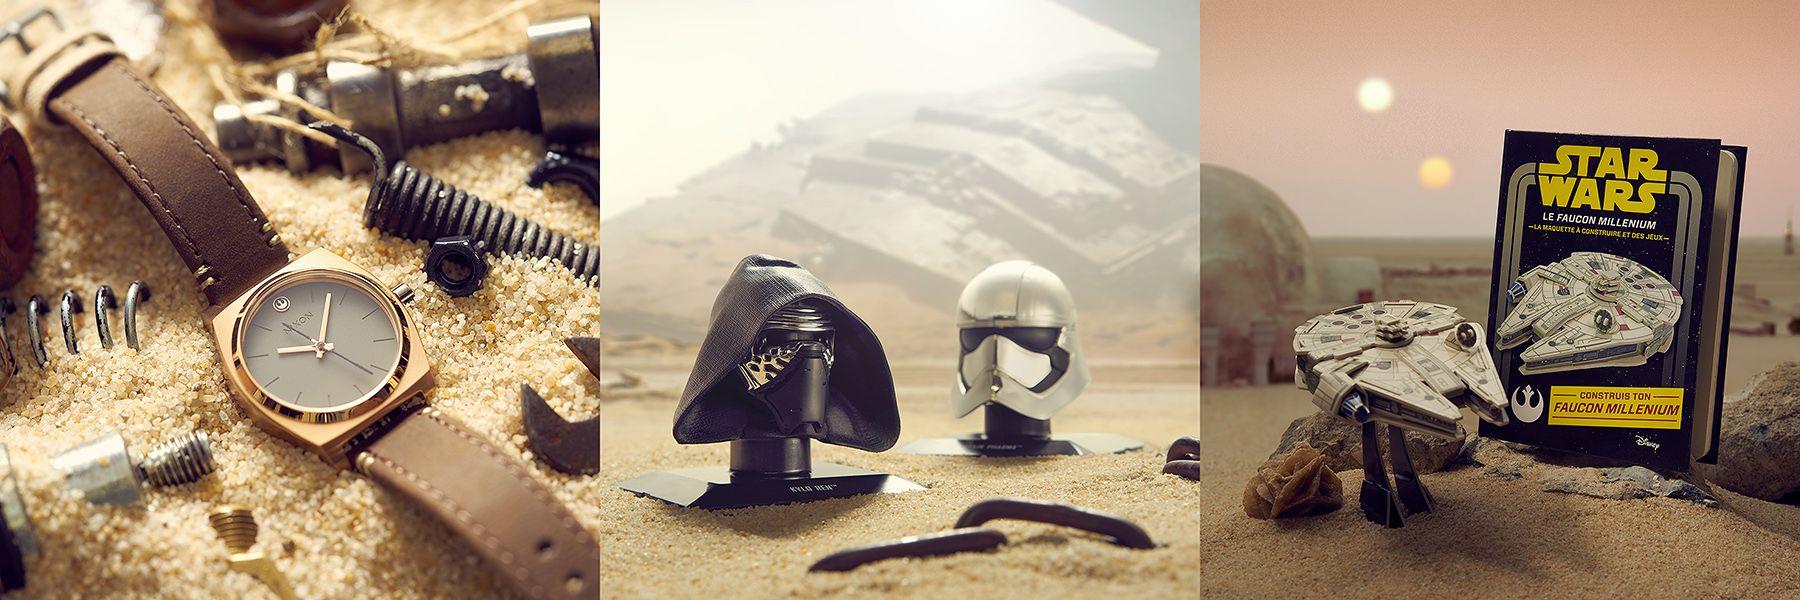 Disney Star Wars (merchandising)